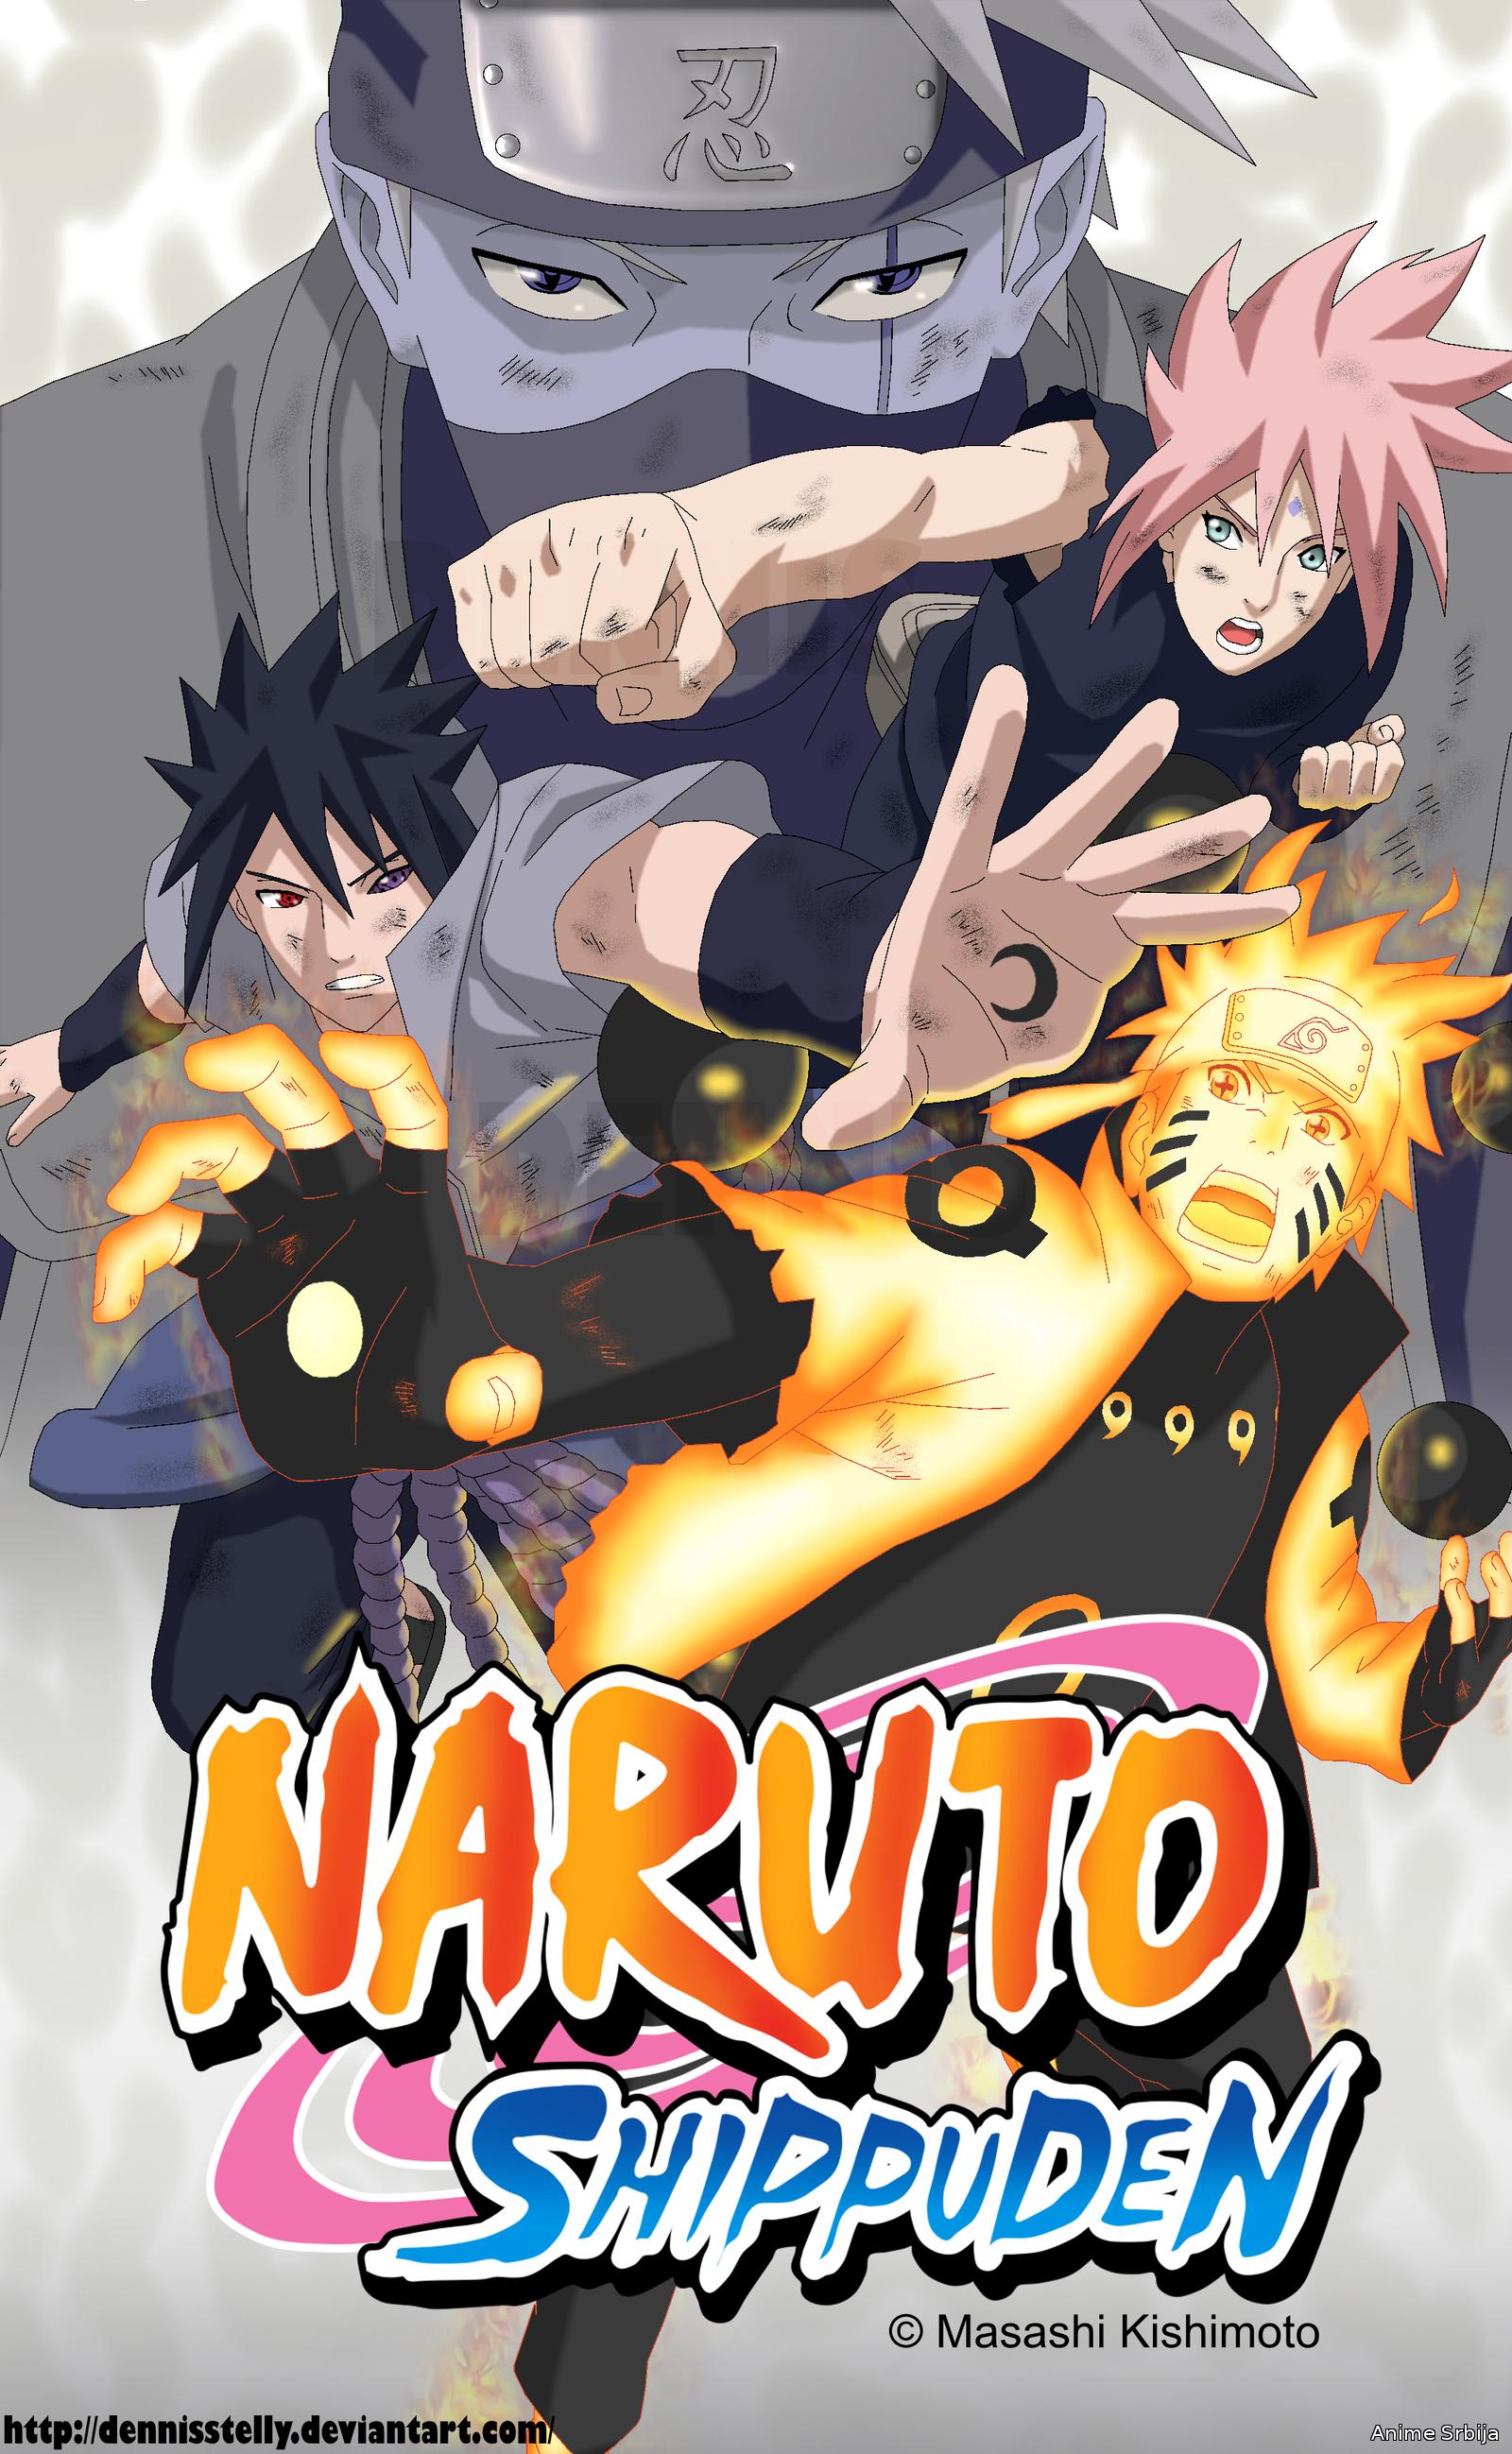 Naruto Shippuden Epizoda 500 - kraj anime serijala